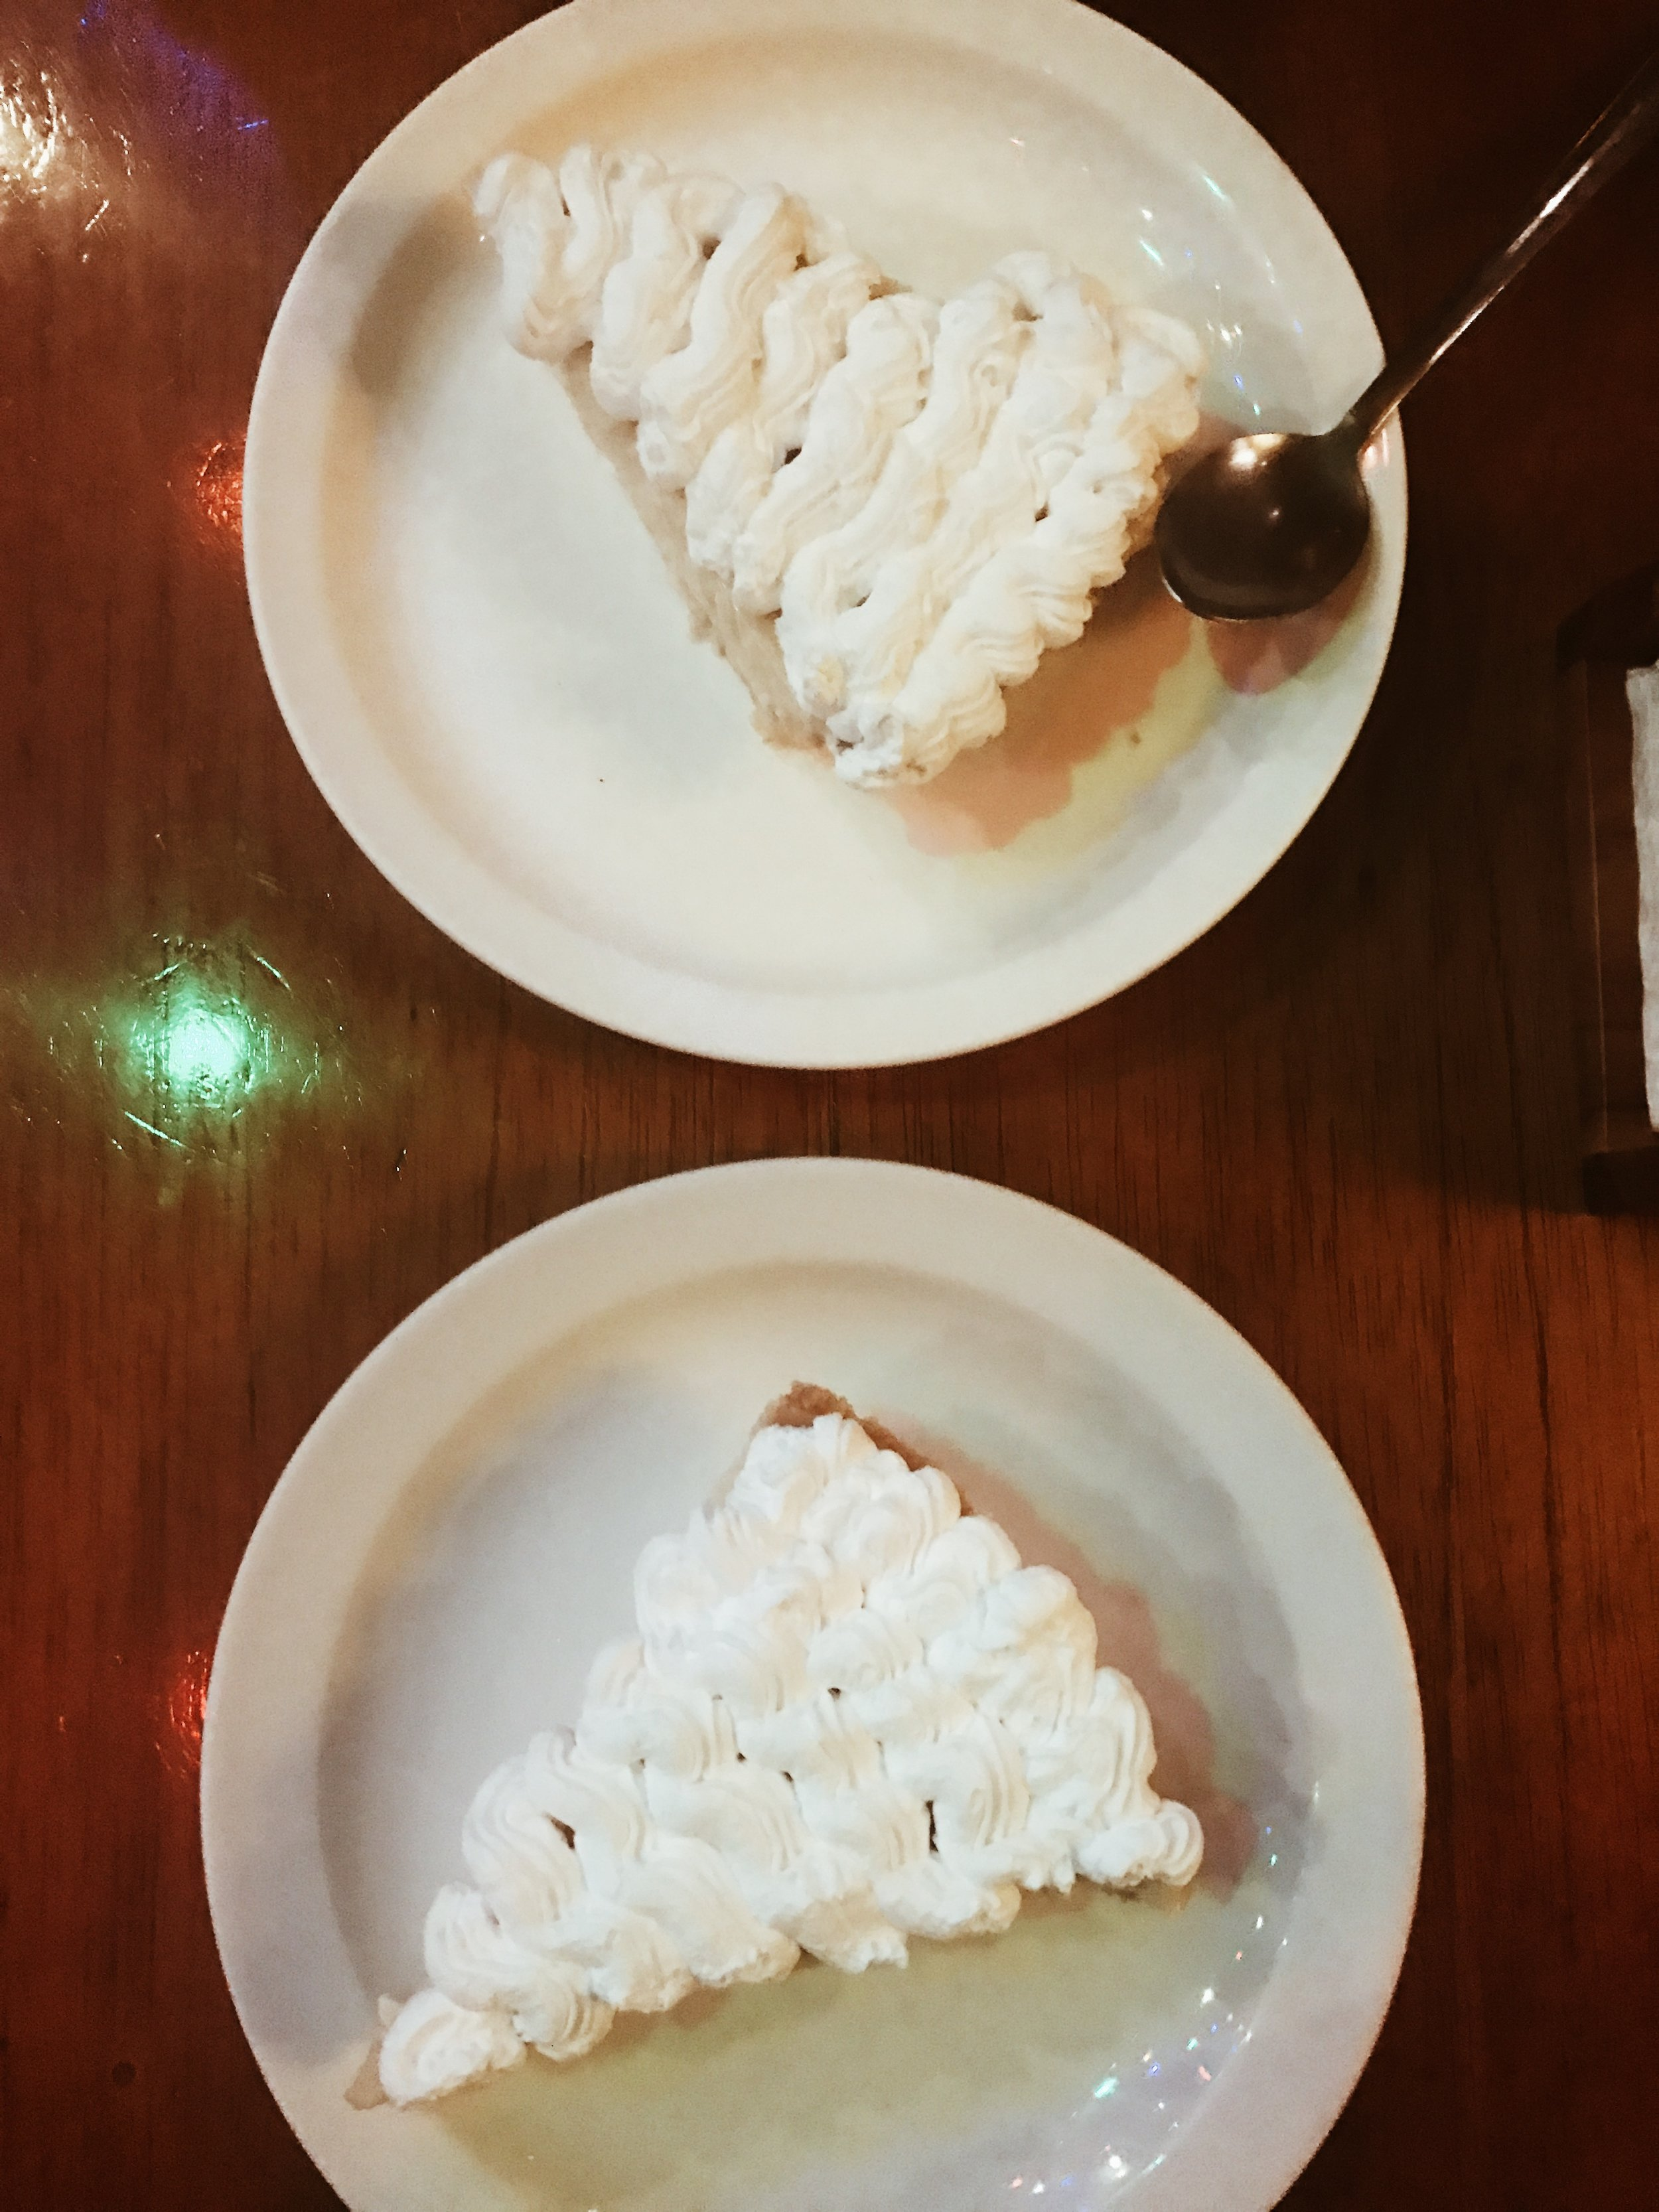 I still dream about this pie